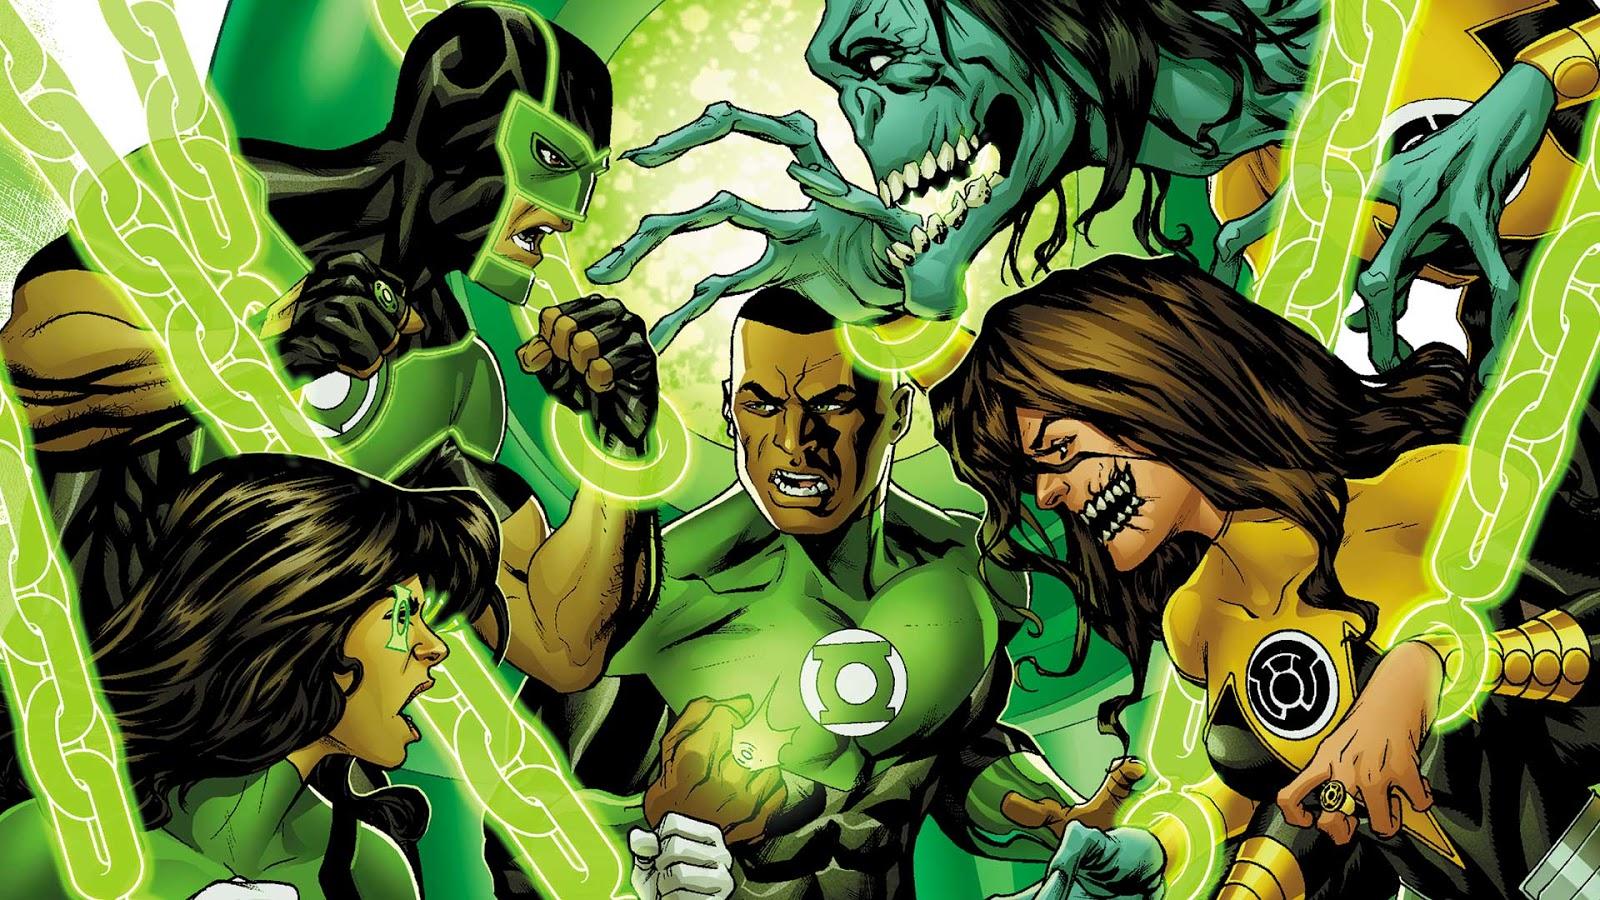 Green Lantern Comic Wallpaper: Weird Science DC Comics: Green Lanterns #24 Review And